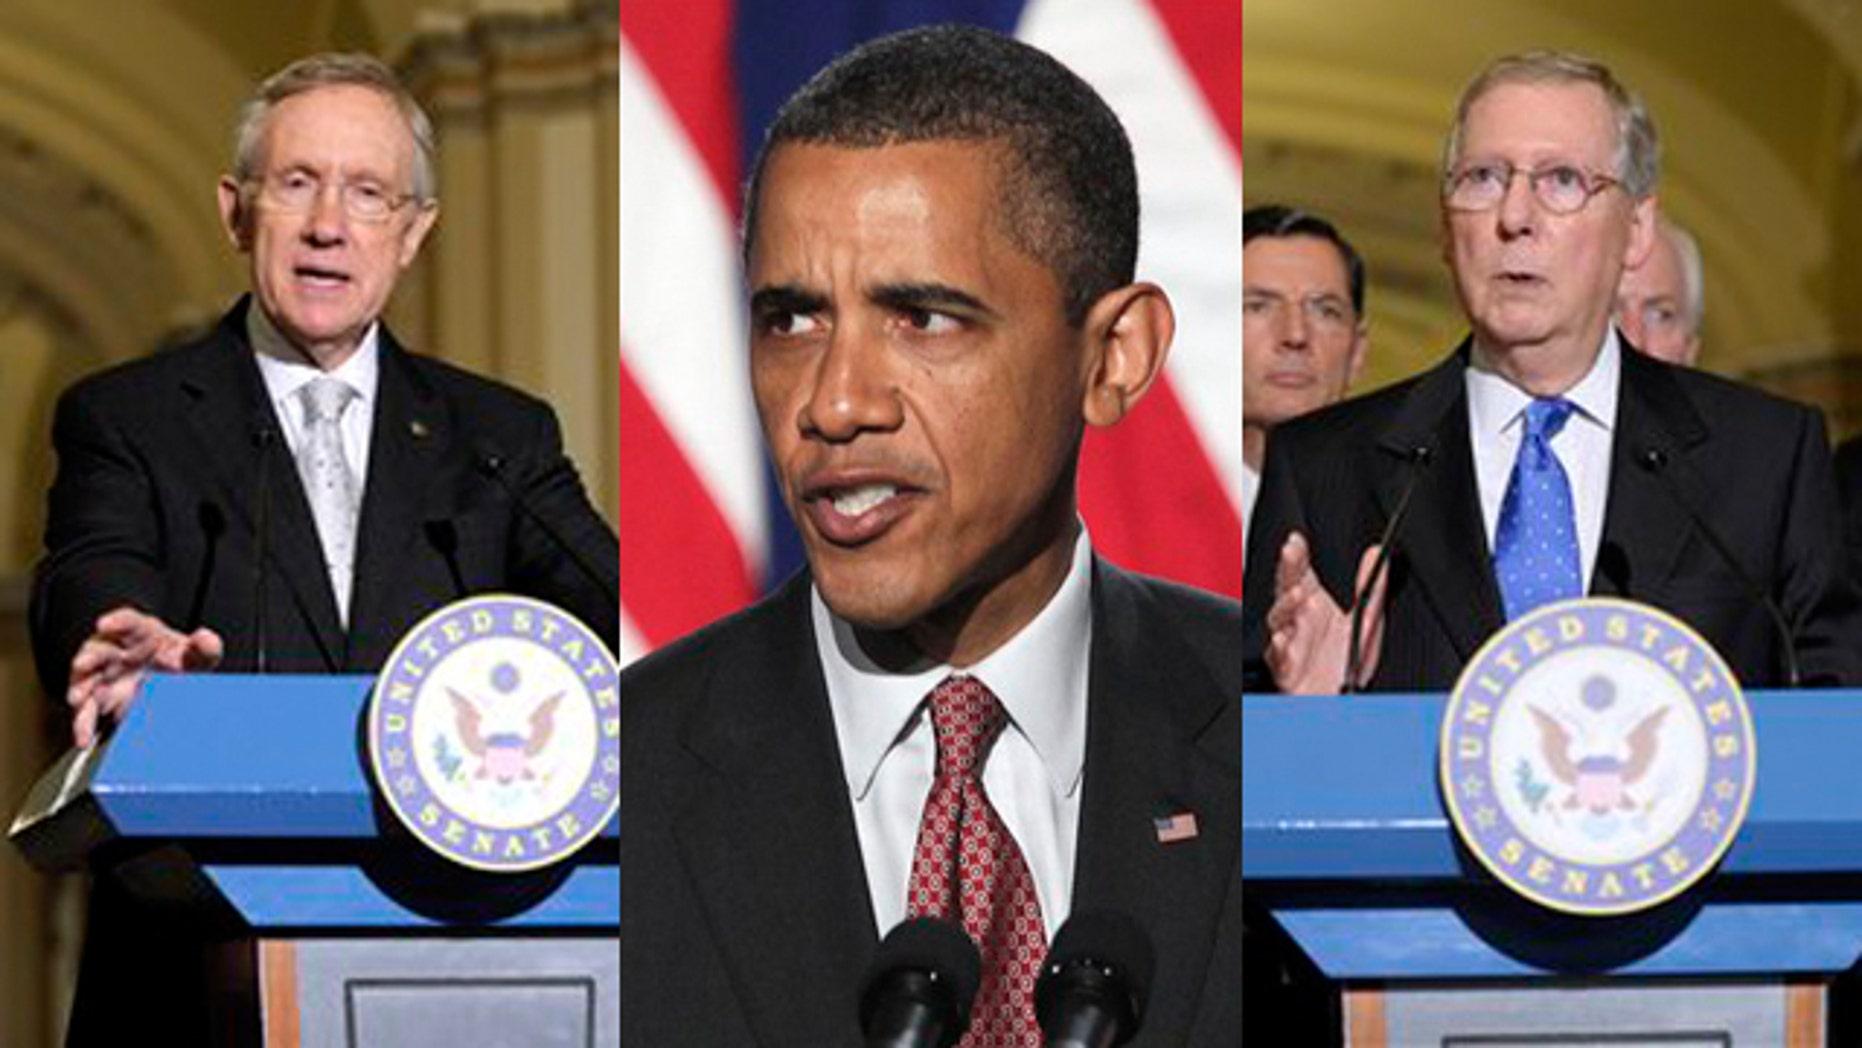 Shown here are Senate Democratic Leader Harry Reid, left, President Obama and Senate Republican Leader Mitch McConnell.